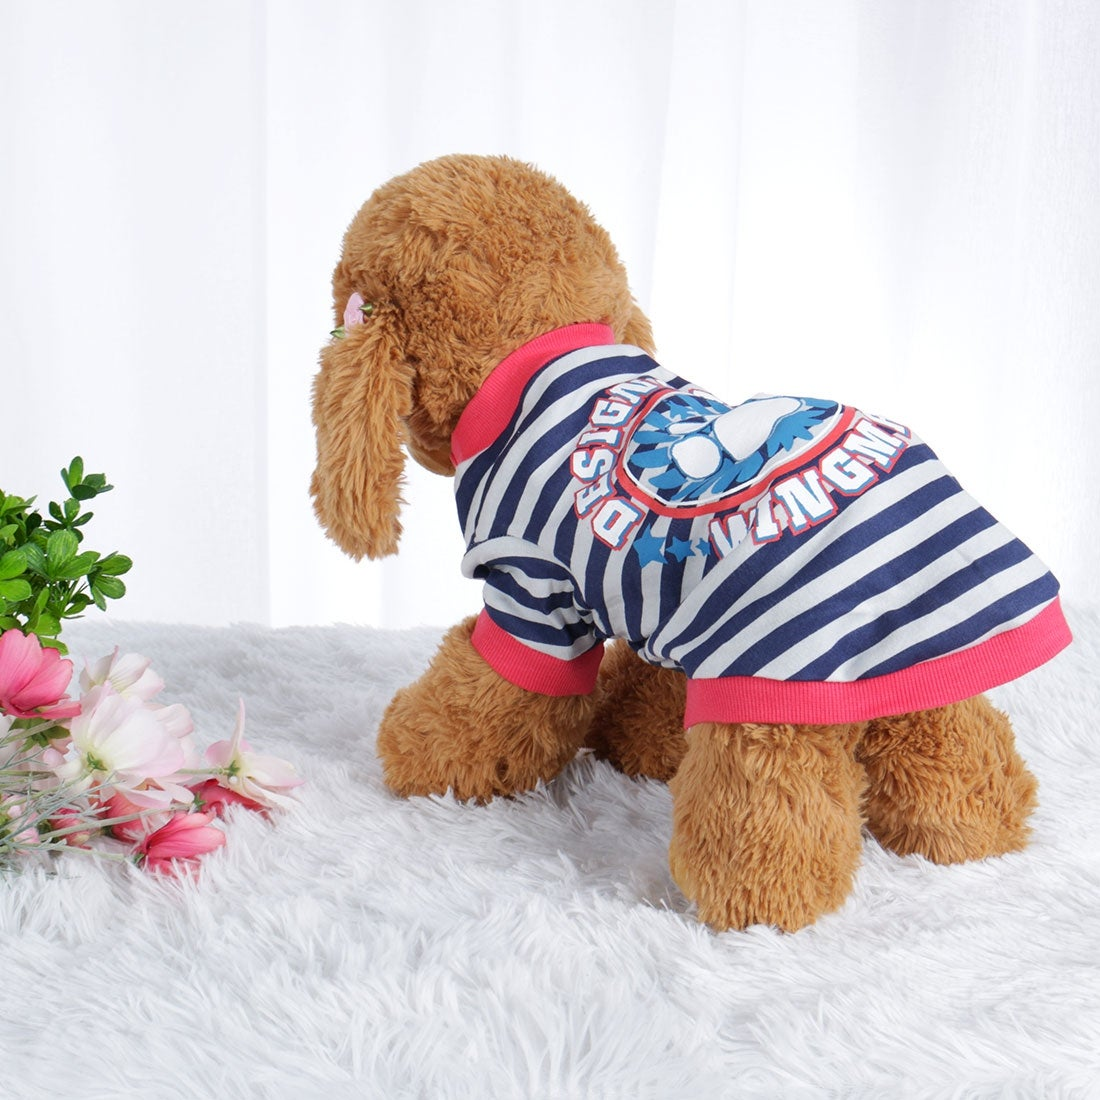 Dog T Shirt Puppy Small Pet Cat Sweatshirt Tops Clothes Apparel Vest Clothing (S)